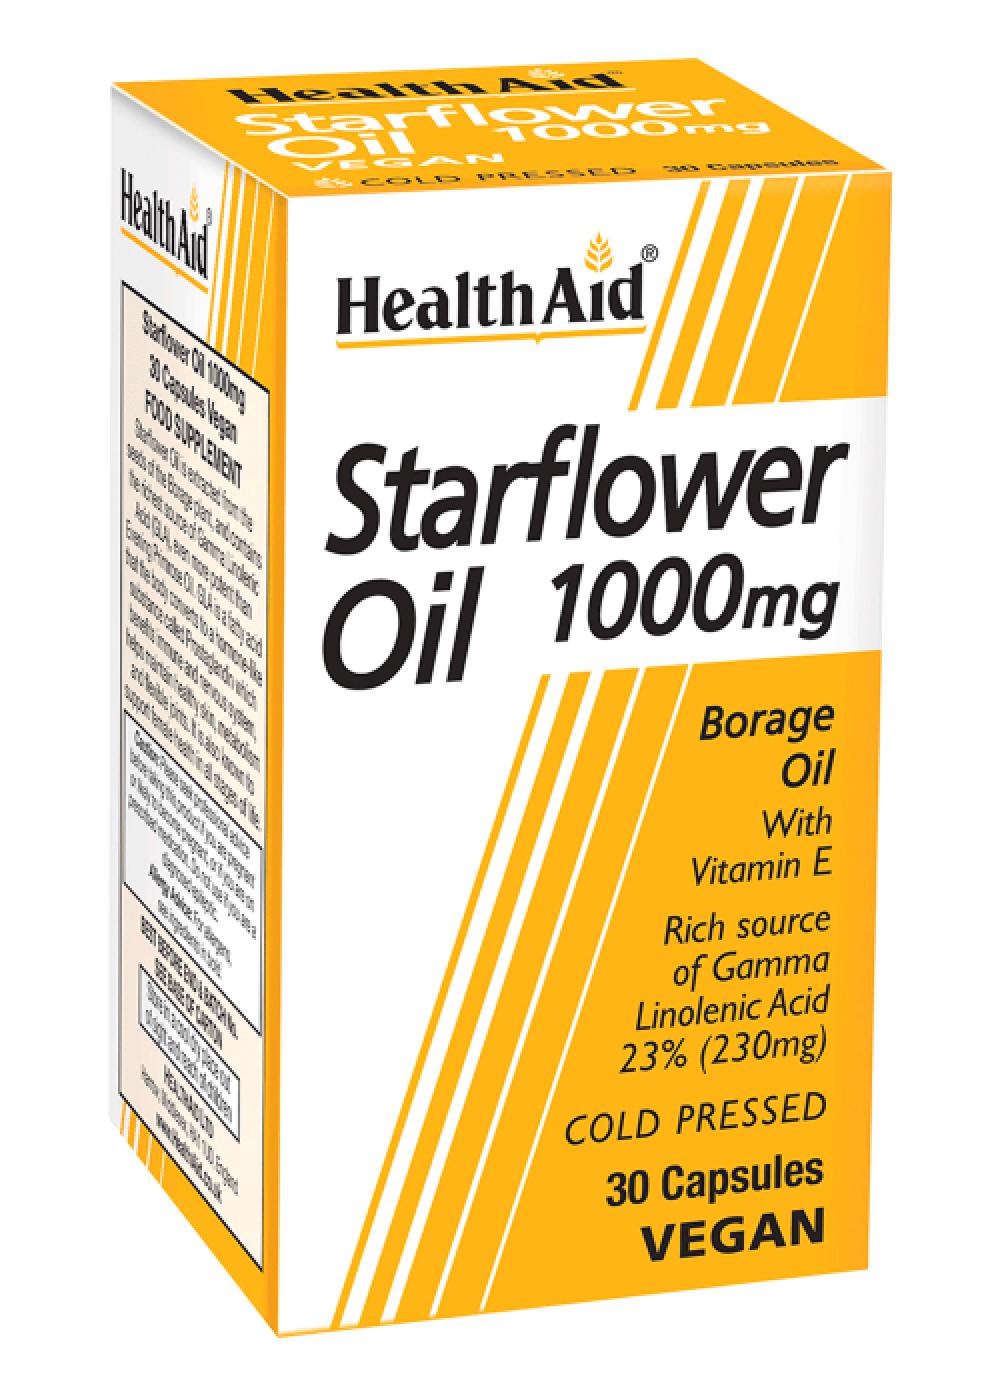 HealthAid Starflower Oil 1000mg (23% GLA) (Borretschöl) 30 Kapseln (vegan)